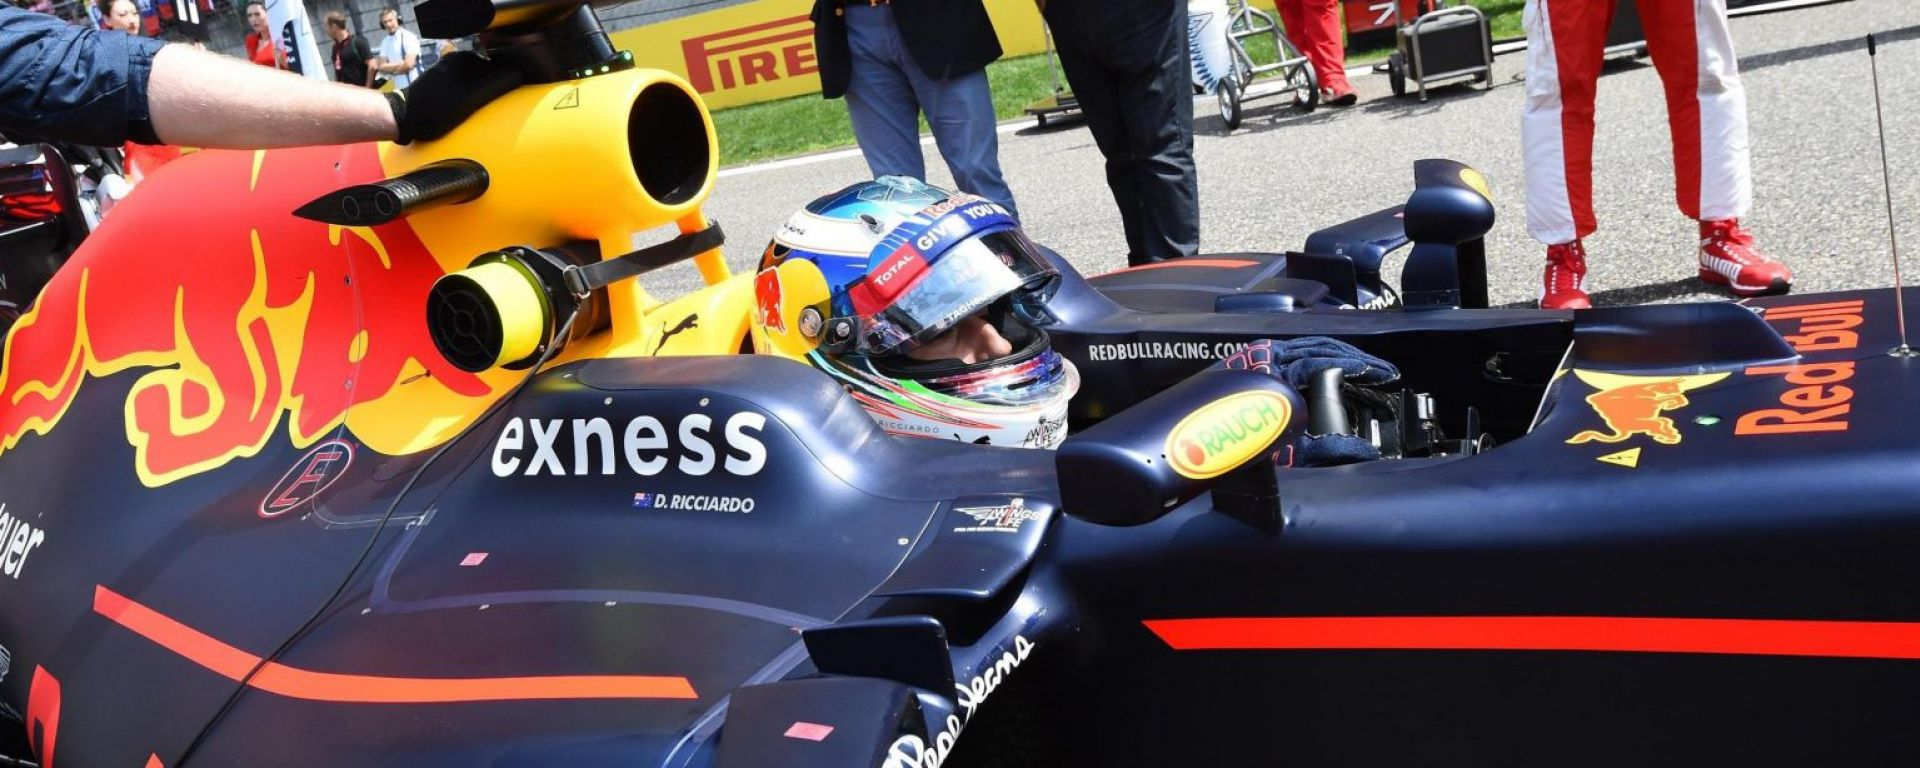 La Red Bull vede Rosso, Ferrari avvisata